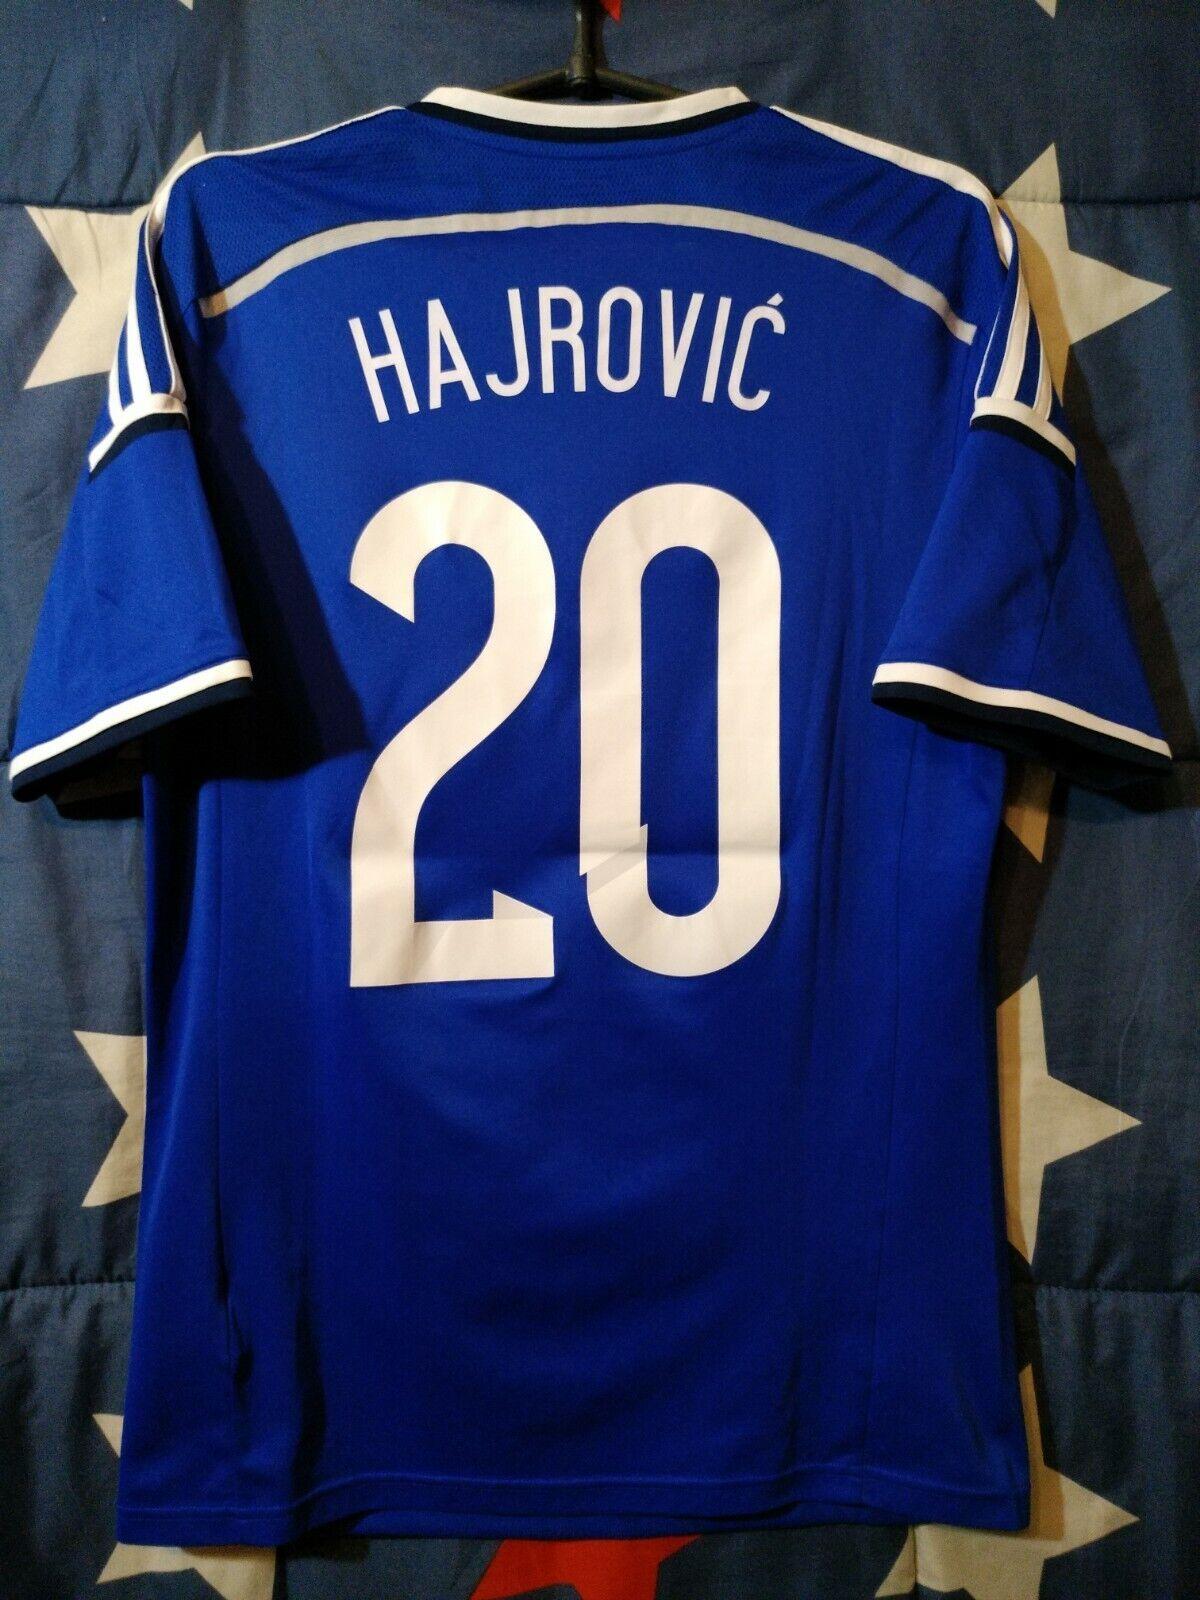 Diuominiione M Bosnia e Herzegovina 2014 MATCH ISSUE Home Footbtutti Shirt Hajrovic  20